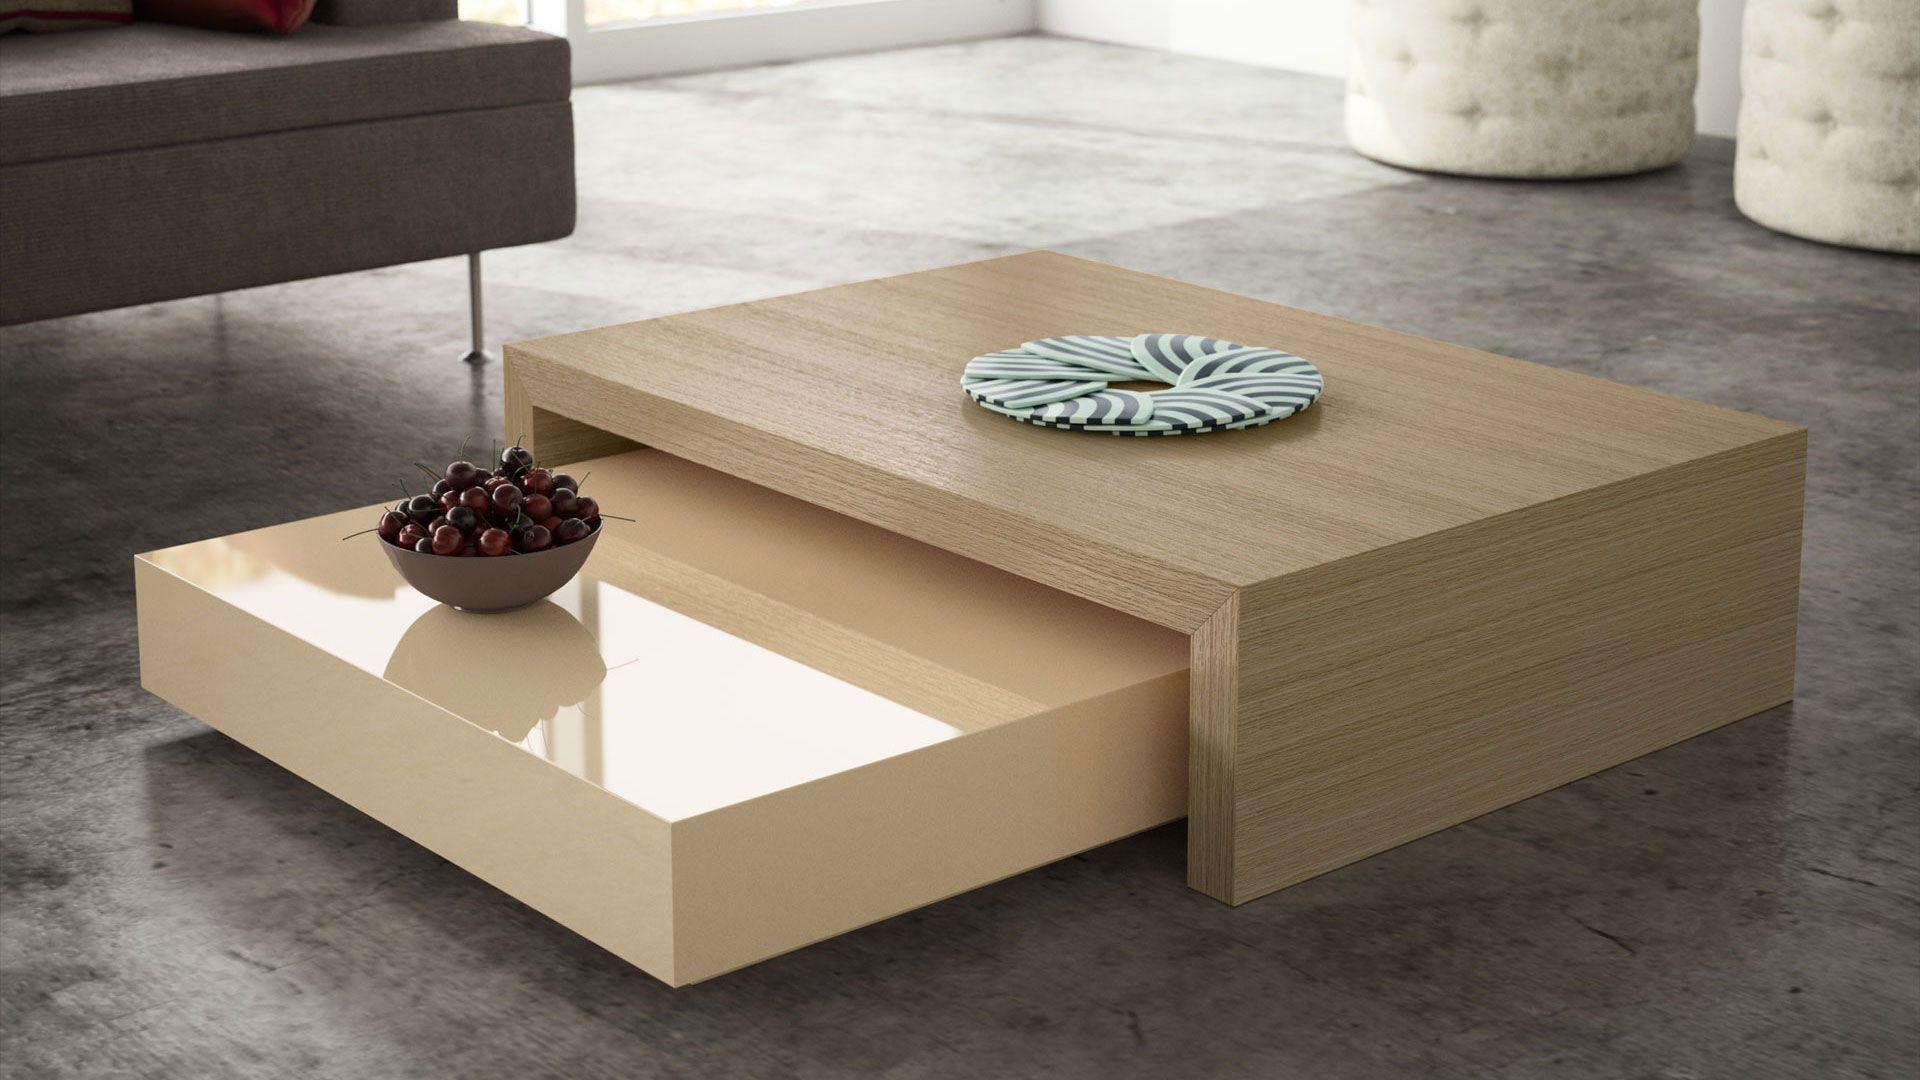 8863411ea125cf5007d74ecb05d94837 Impressionnant De Table Basse Opium Conception